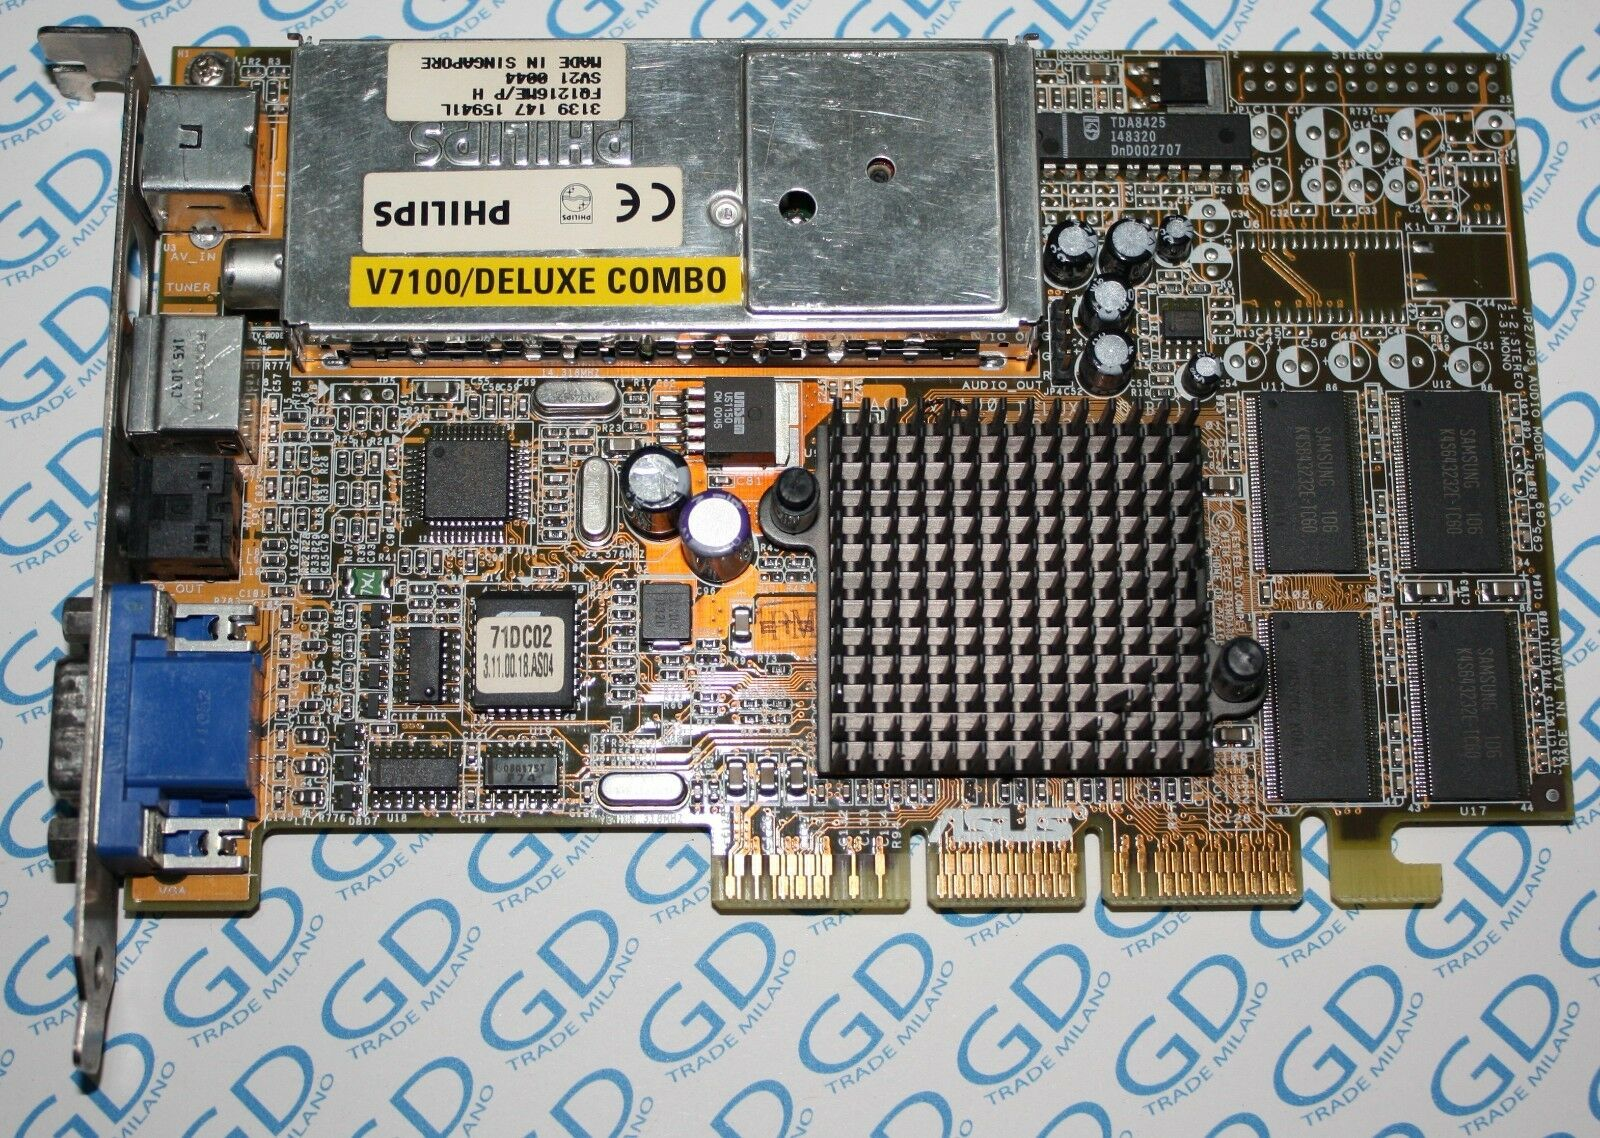 ASUS v7100 Deluxe Combo Philips DC 32m P I c1v0i1